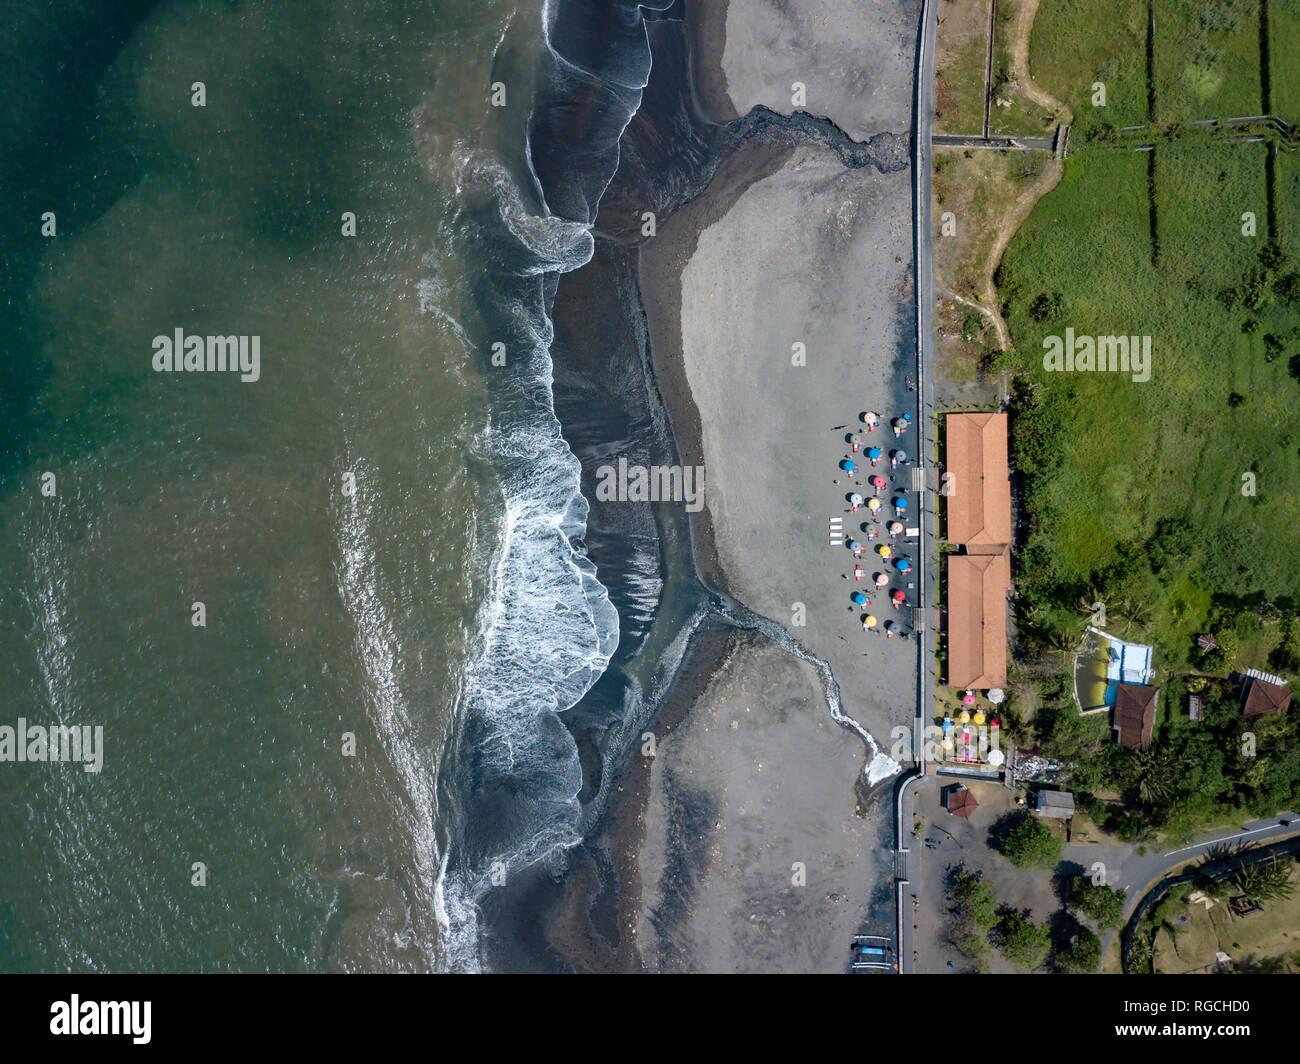 Indonesia, Bali, Aerial view of Yeh Gangga beach - Stock Image